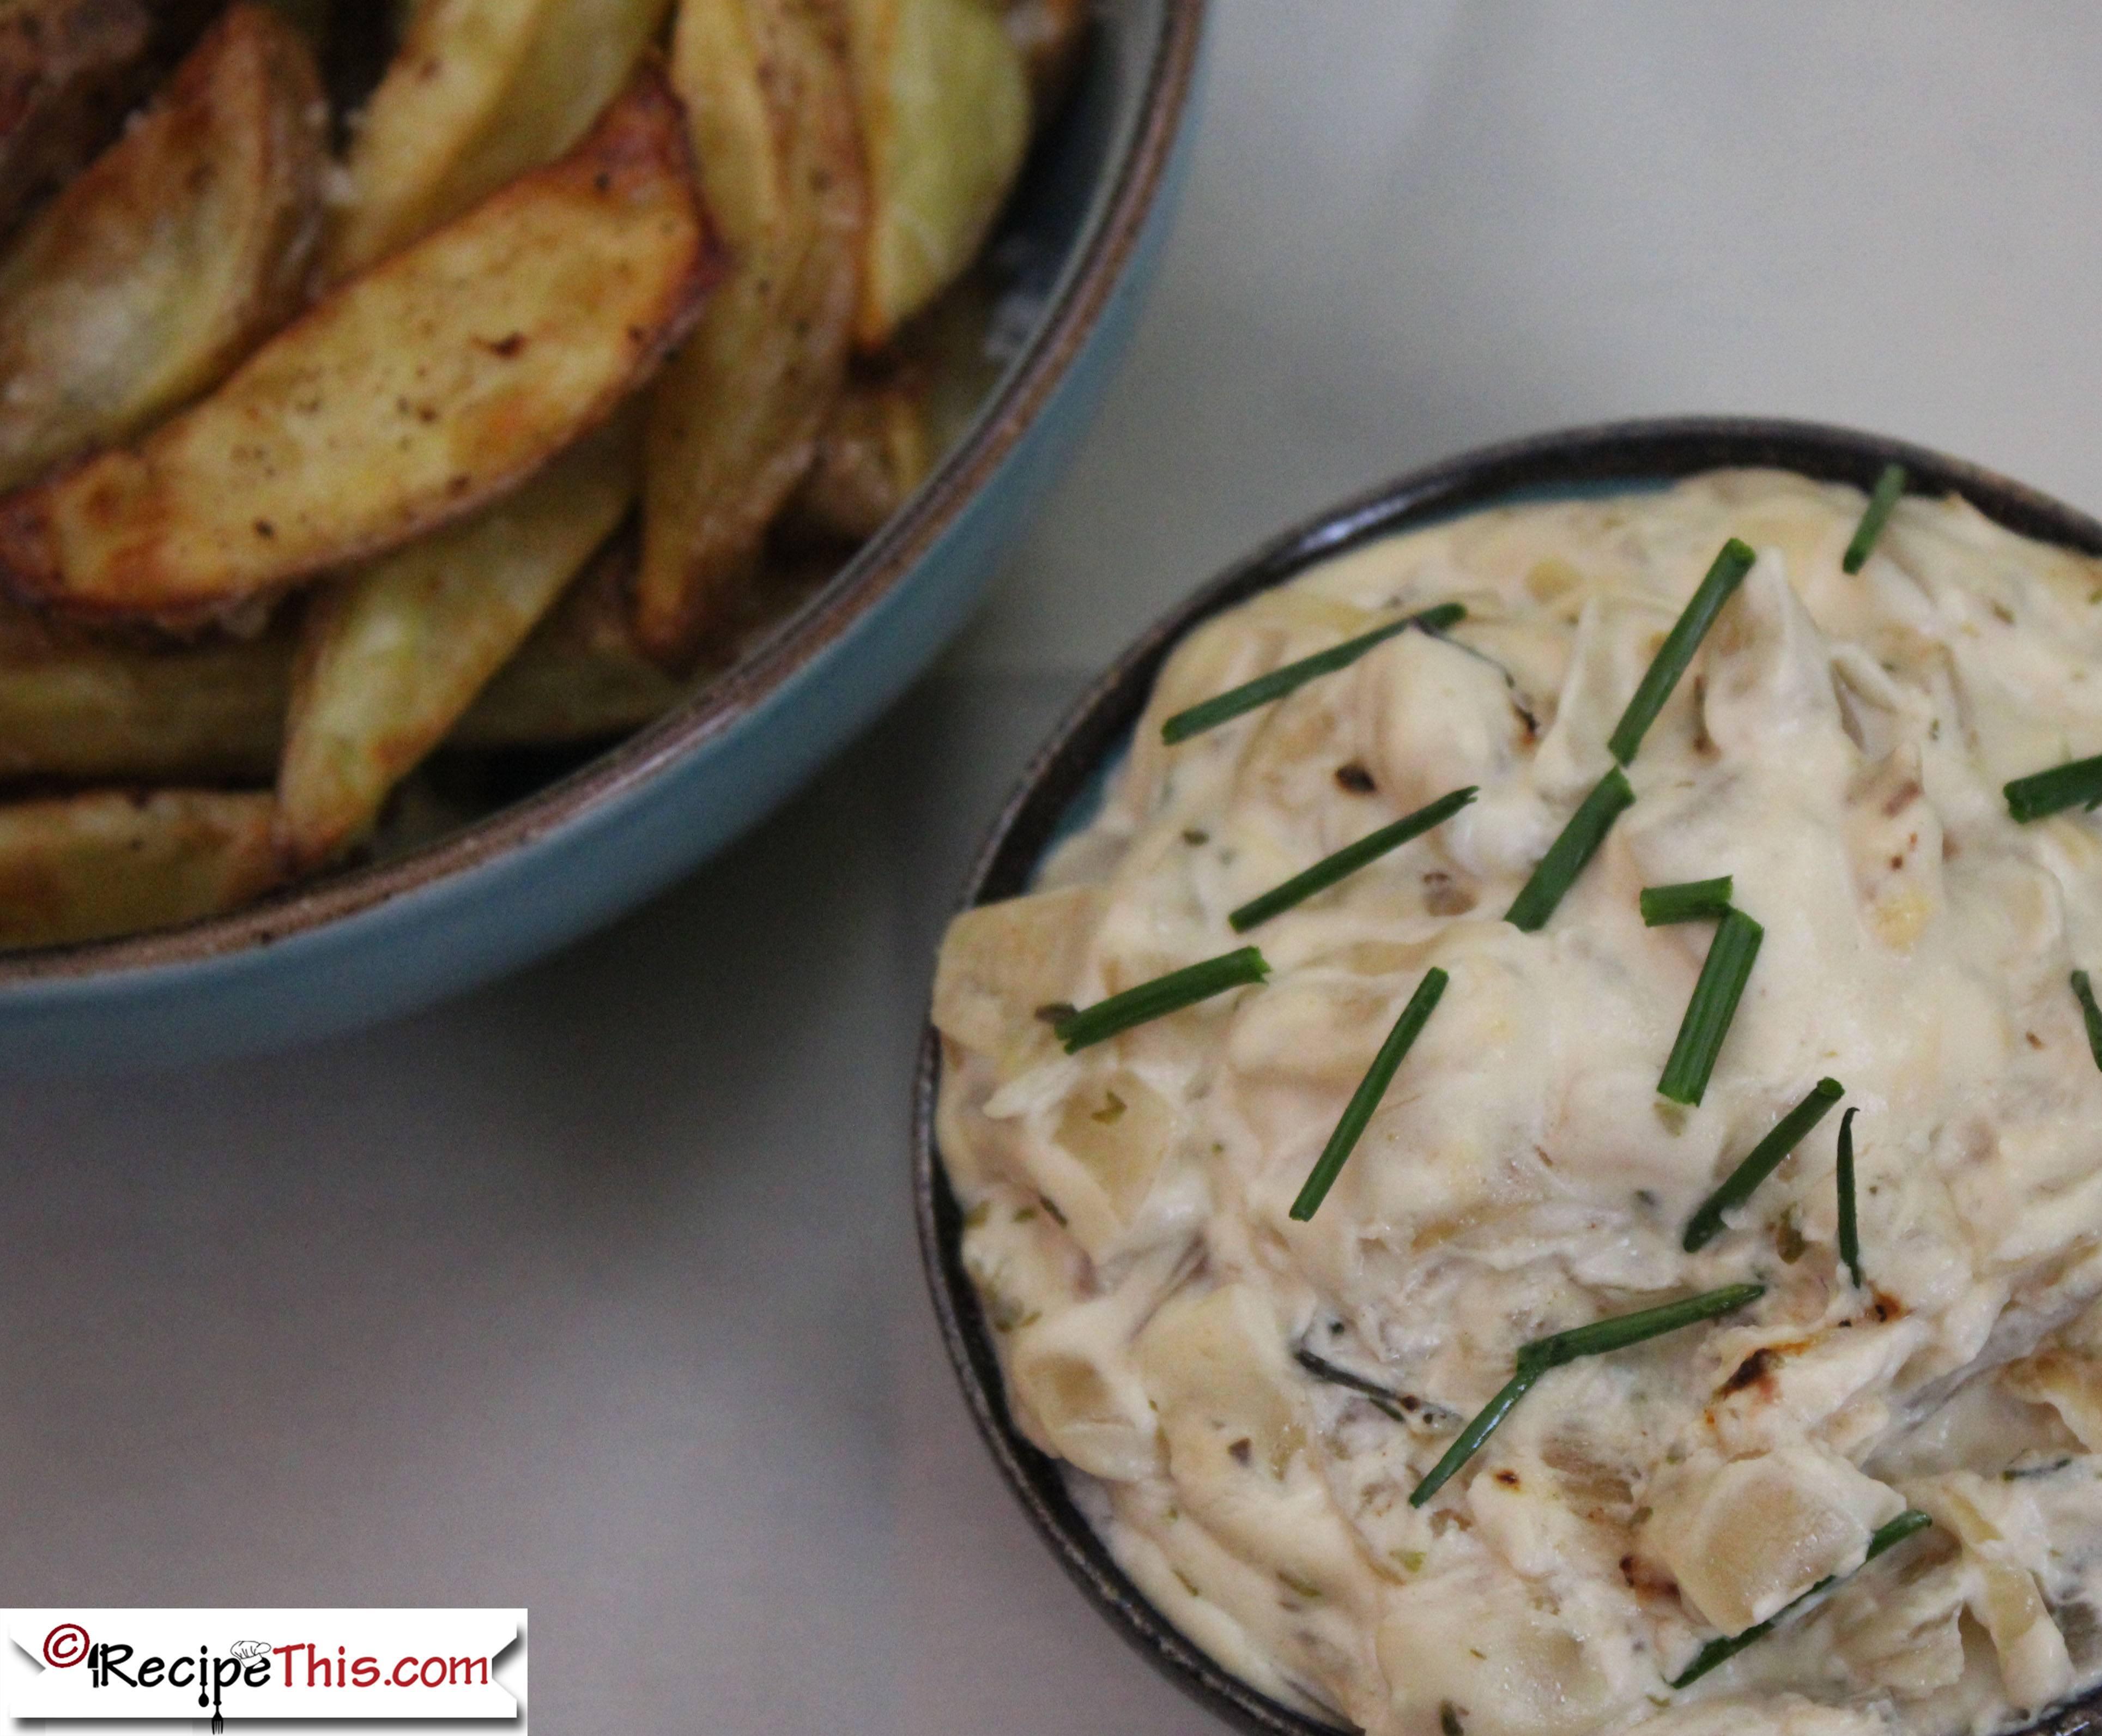 Crockpot French Onion Dip